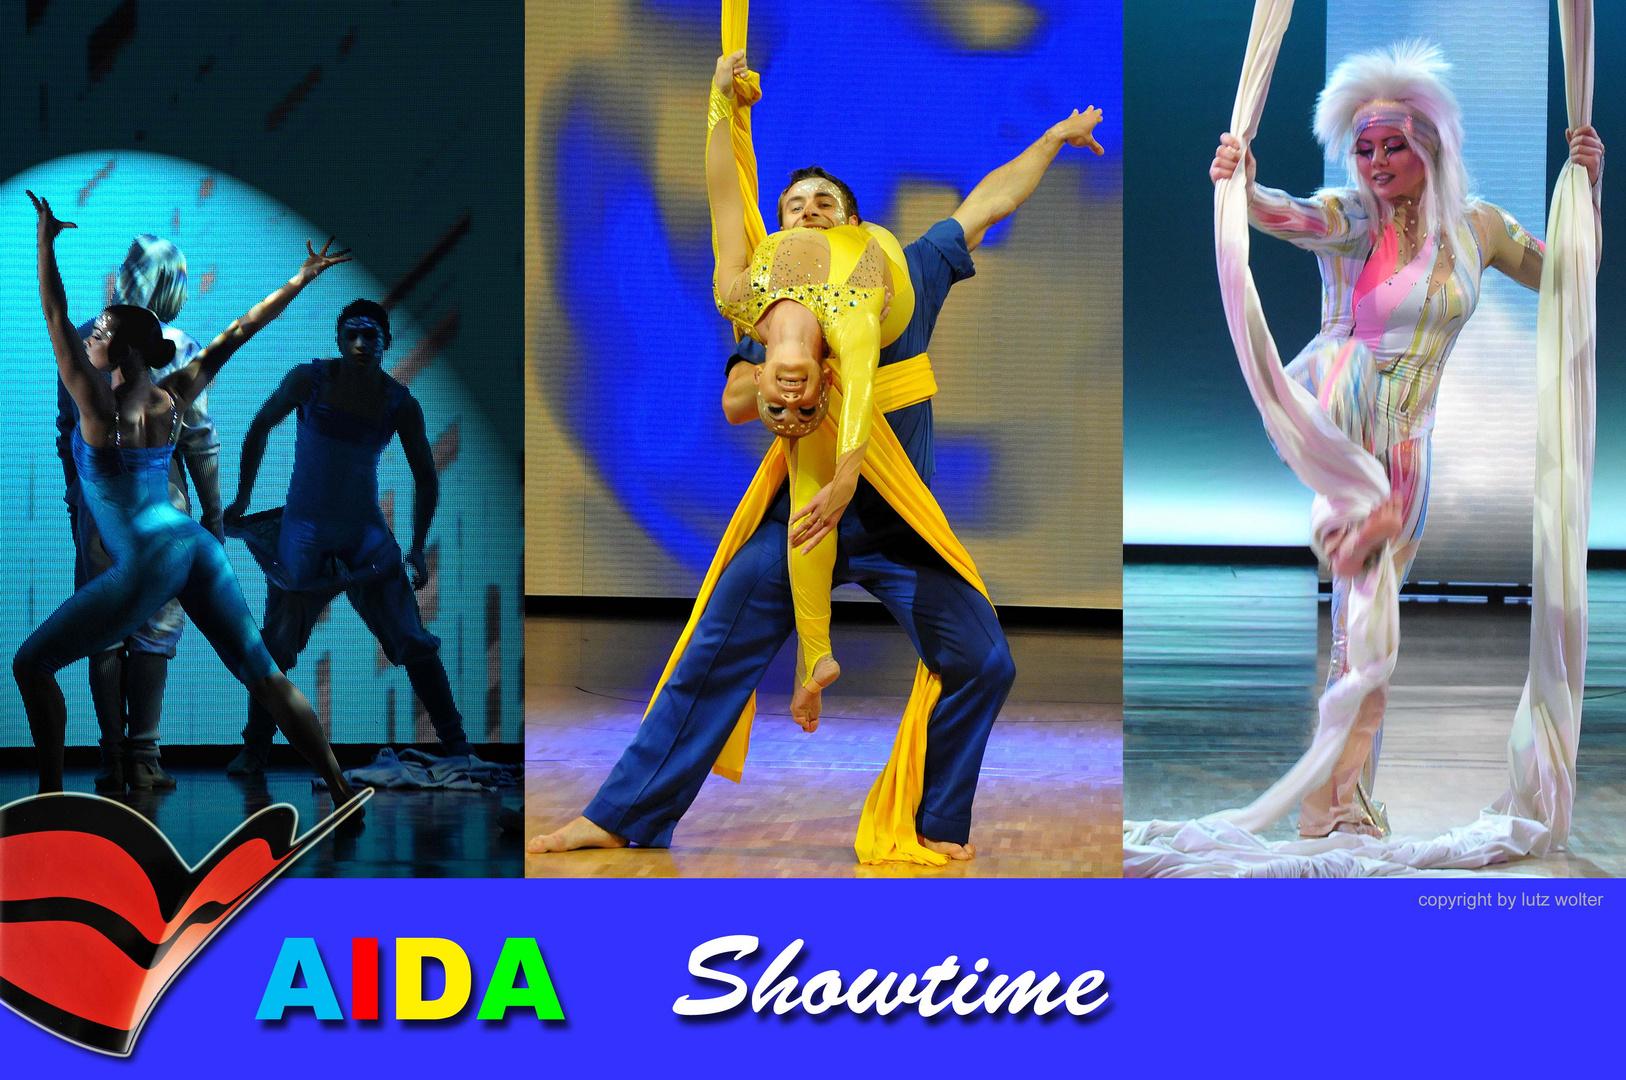 AIDA - Showtime